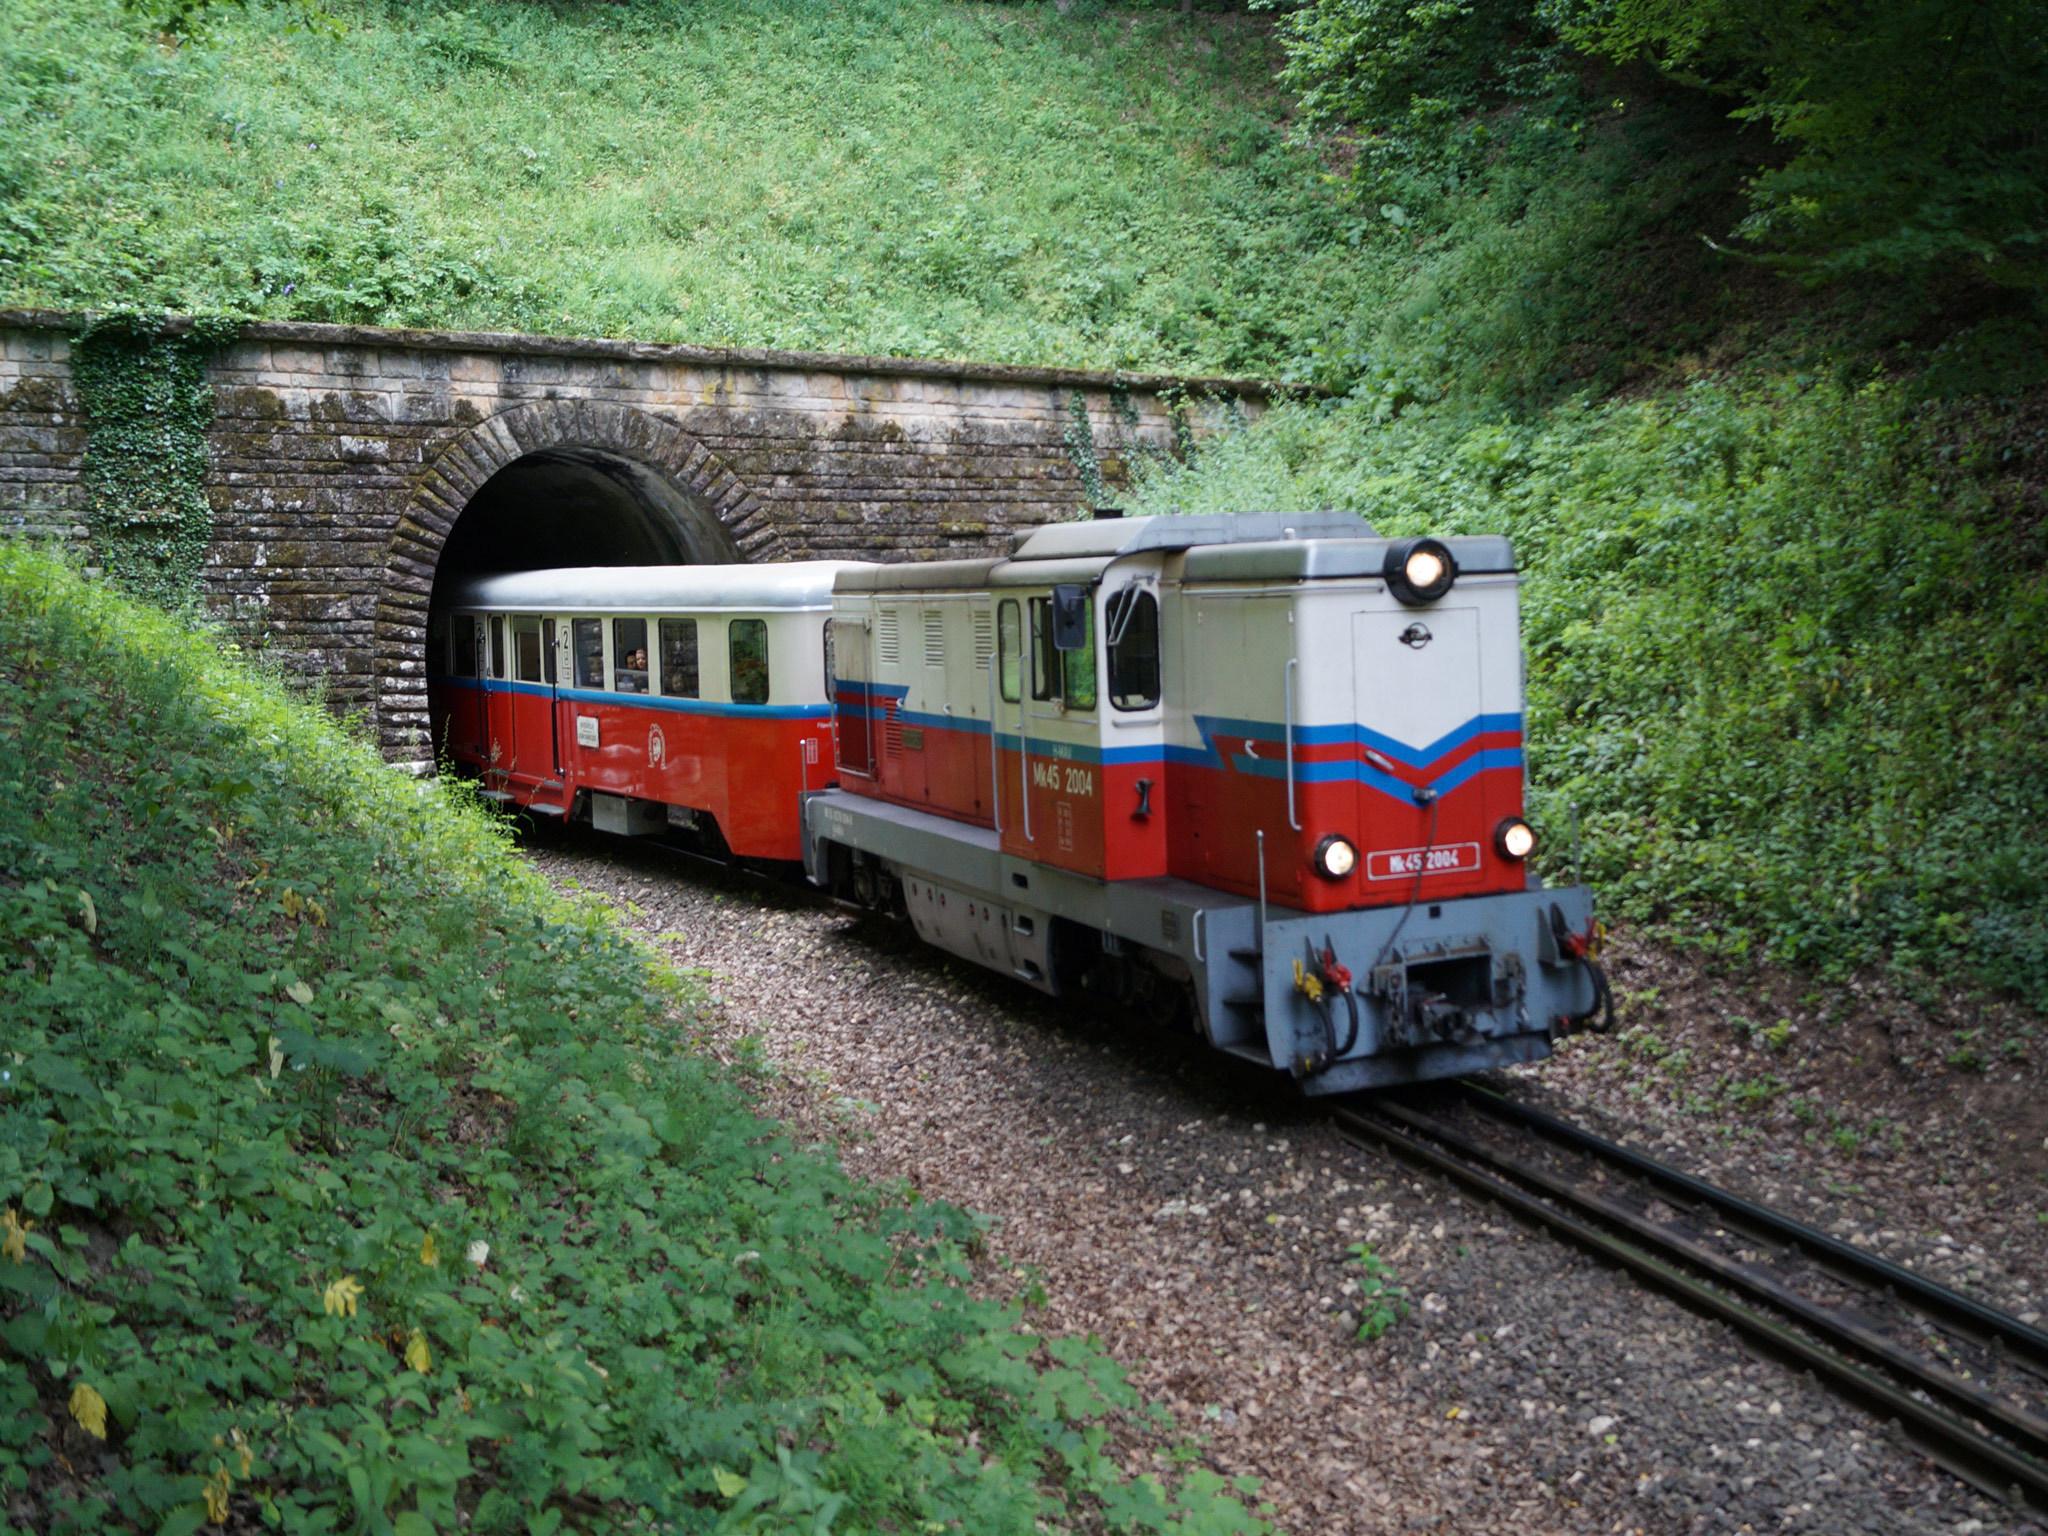 The Children's Railway near Budapest